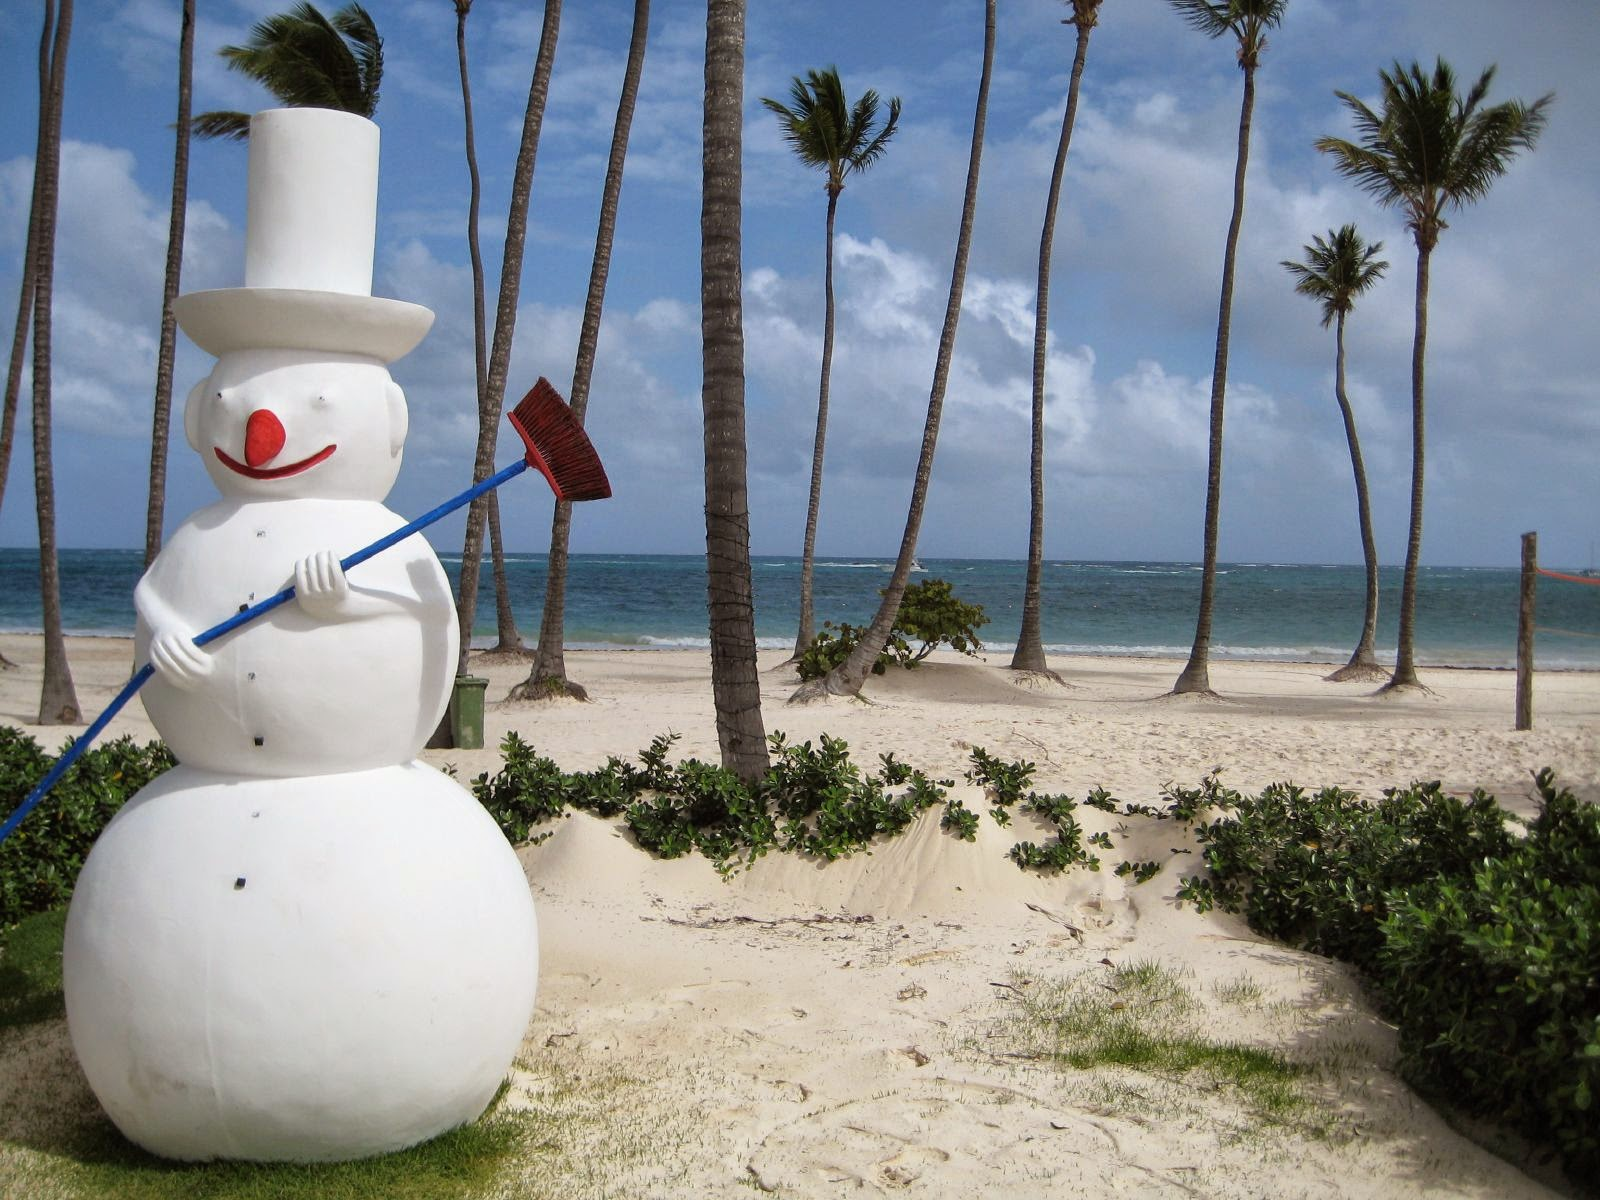 Winter Activities Writing Teachers Pay Teachers Promoting-Success